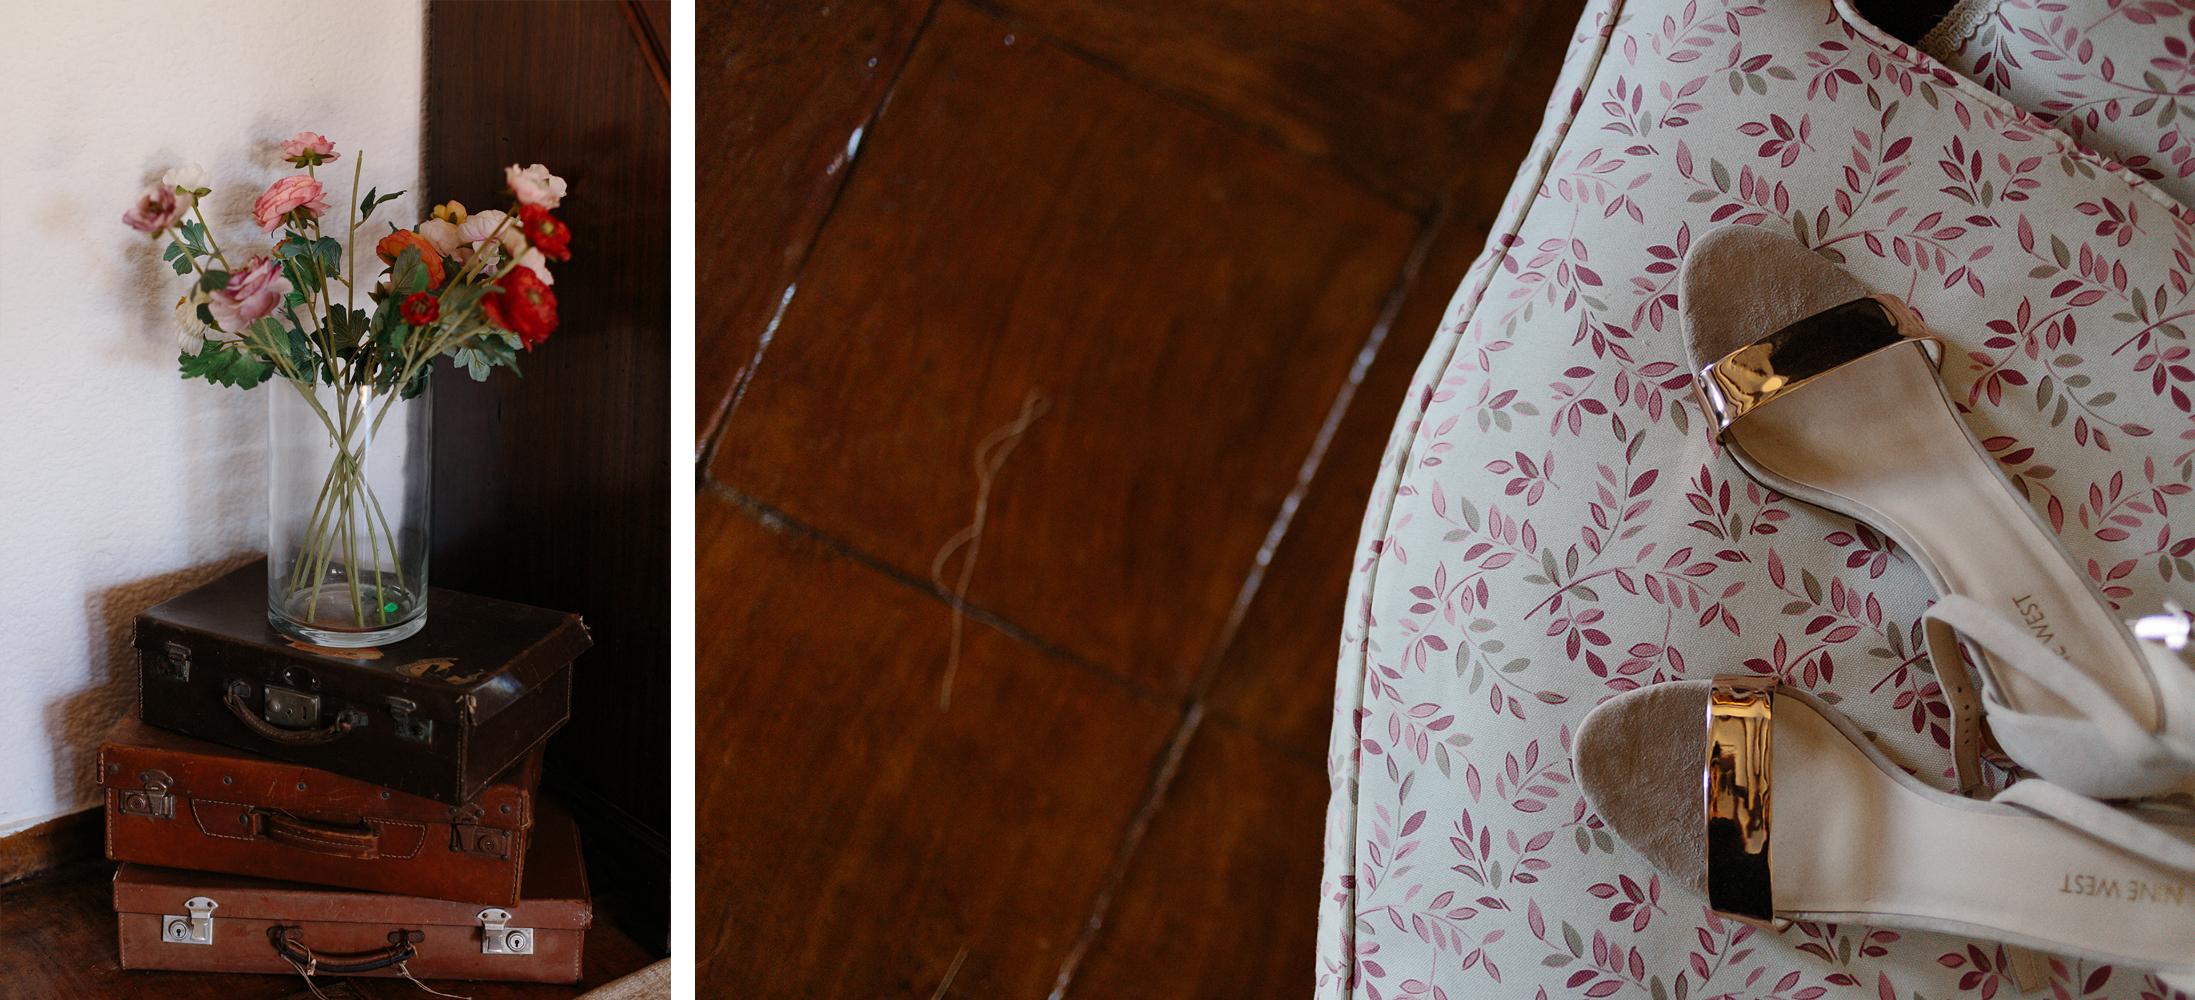 spread1-european-wedding-spain-wedding-photographer-destination-wedding-photographer-from-toronto-ryanne-hollies-photography-documentary-editorial-style-spanish-british-valencia-private-villa-wedding-day-details-vintage-wedding-shoes.jpg